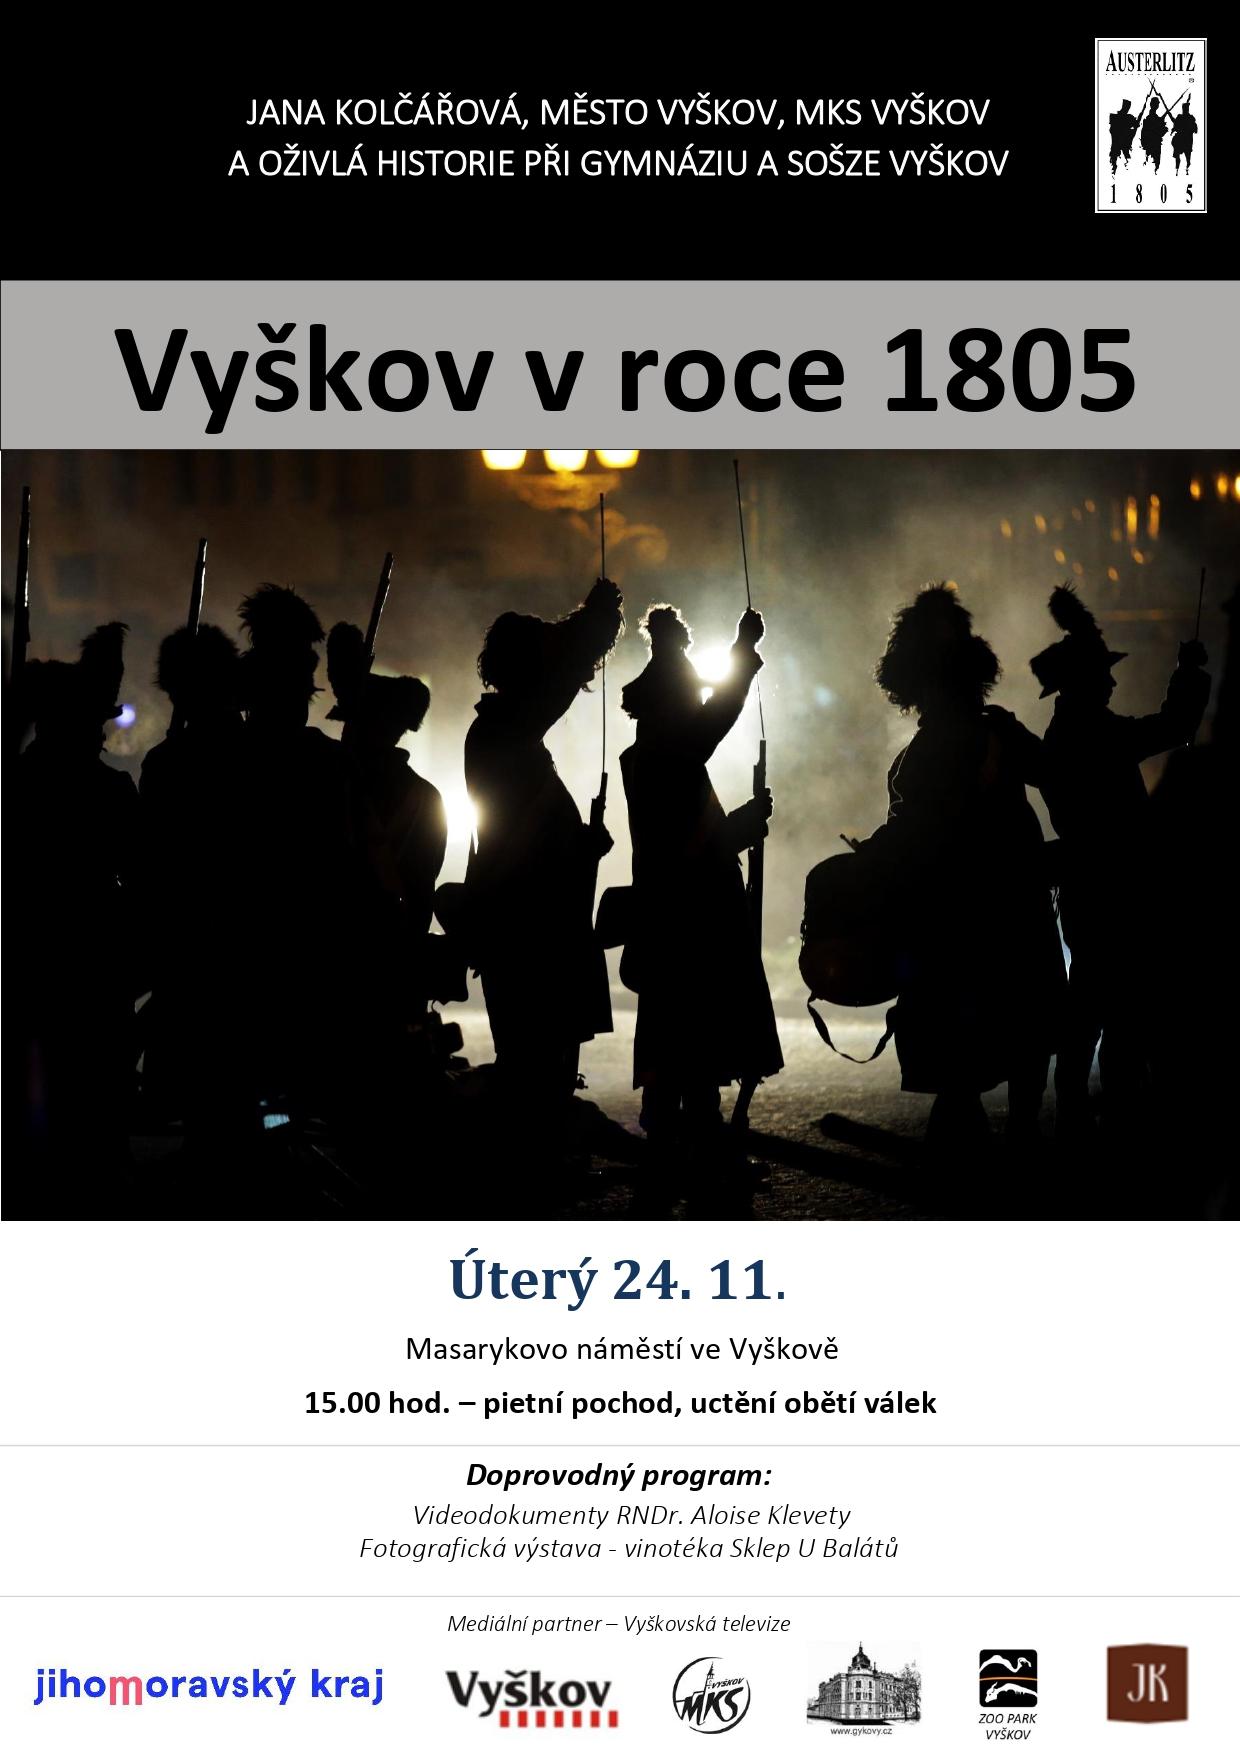 plakat vyškov 1805/2020